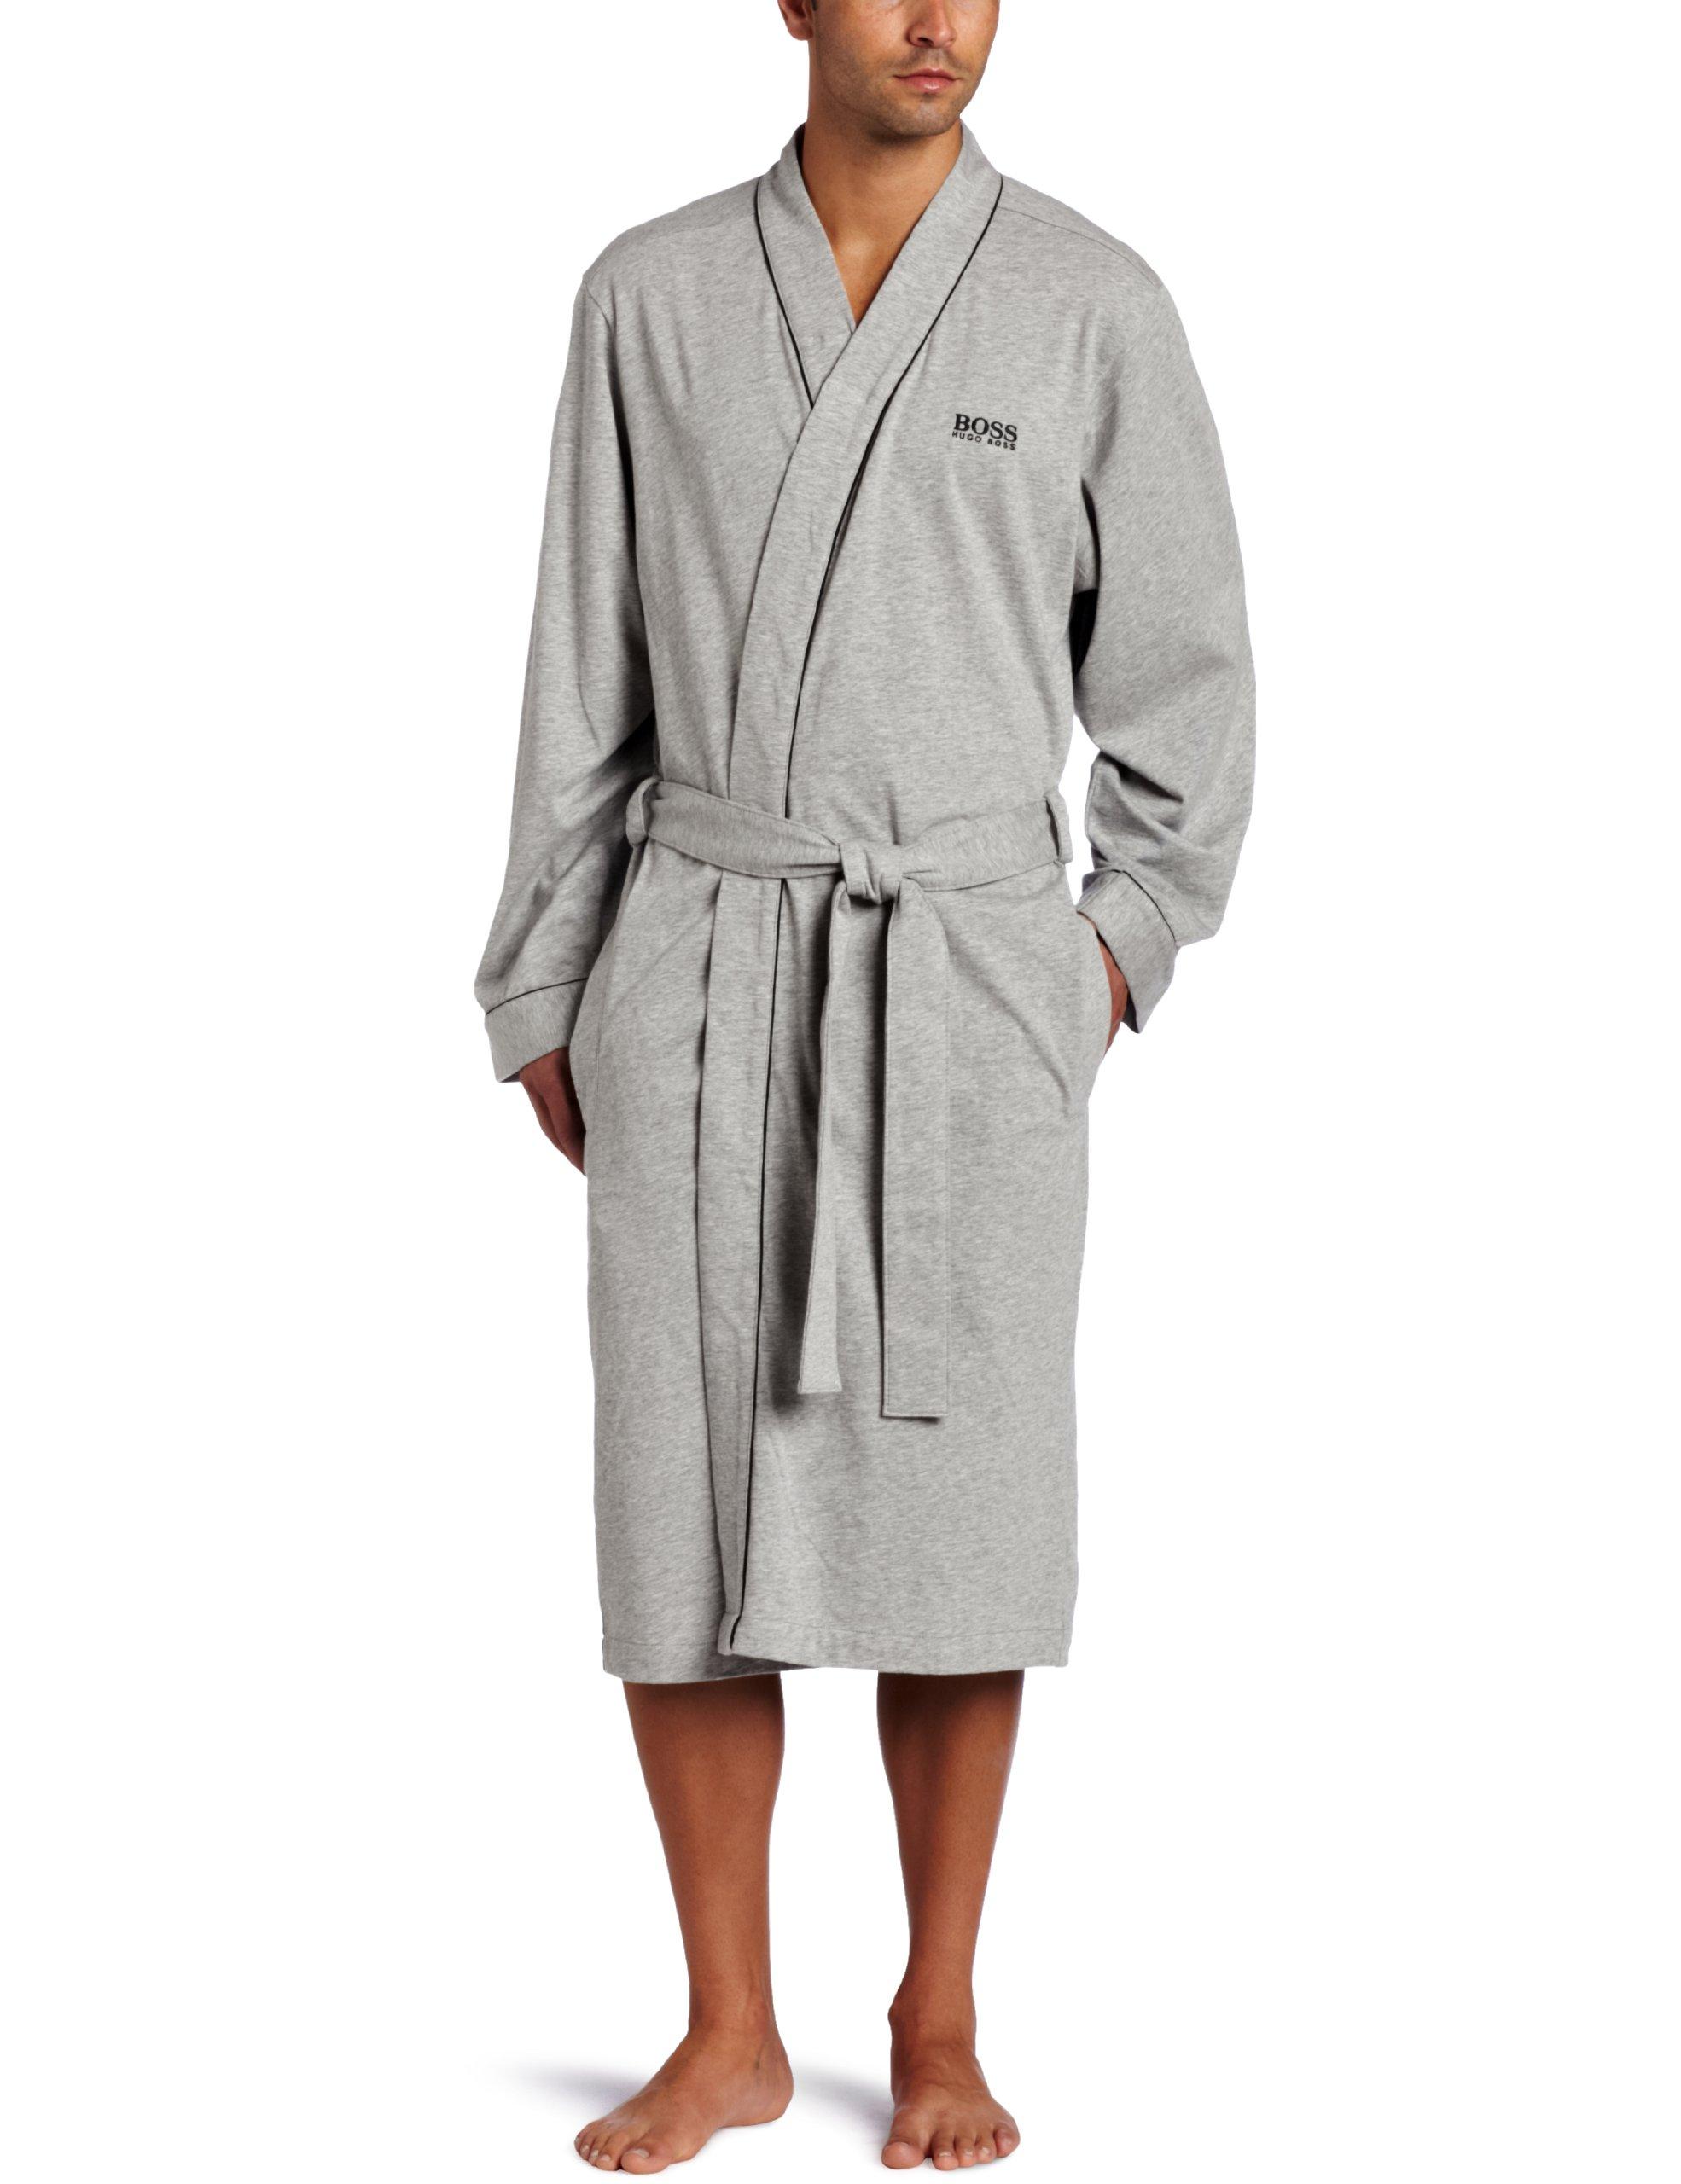 HUGO BOSS Men's Kimono Long Sleeve Robe, Grey, X-Large